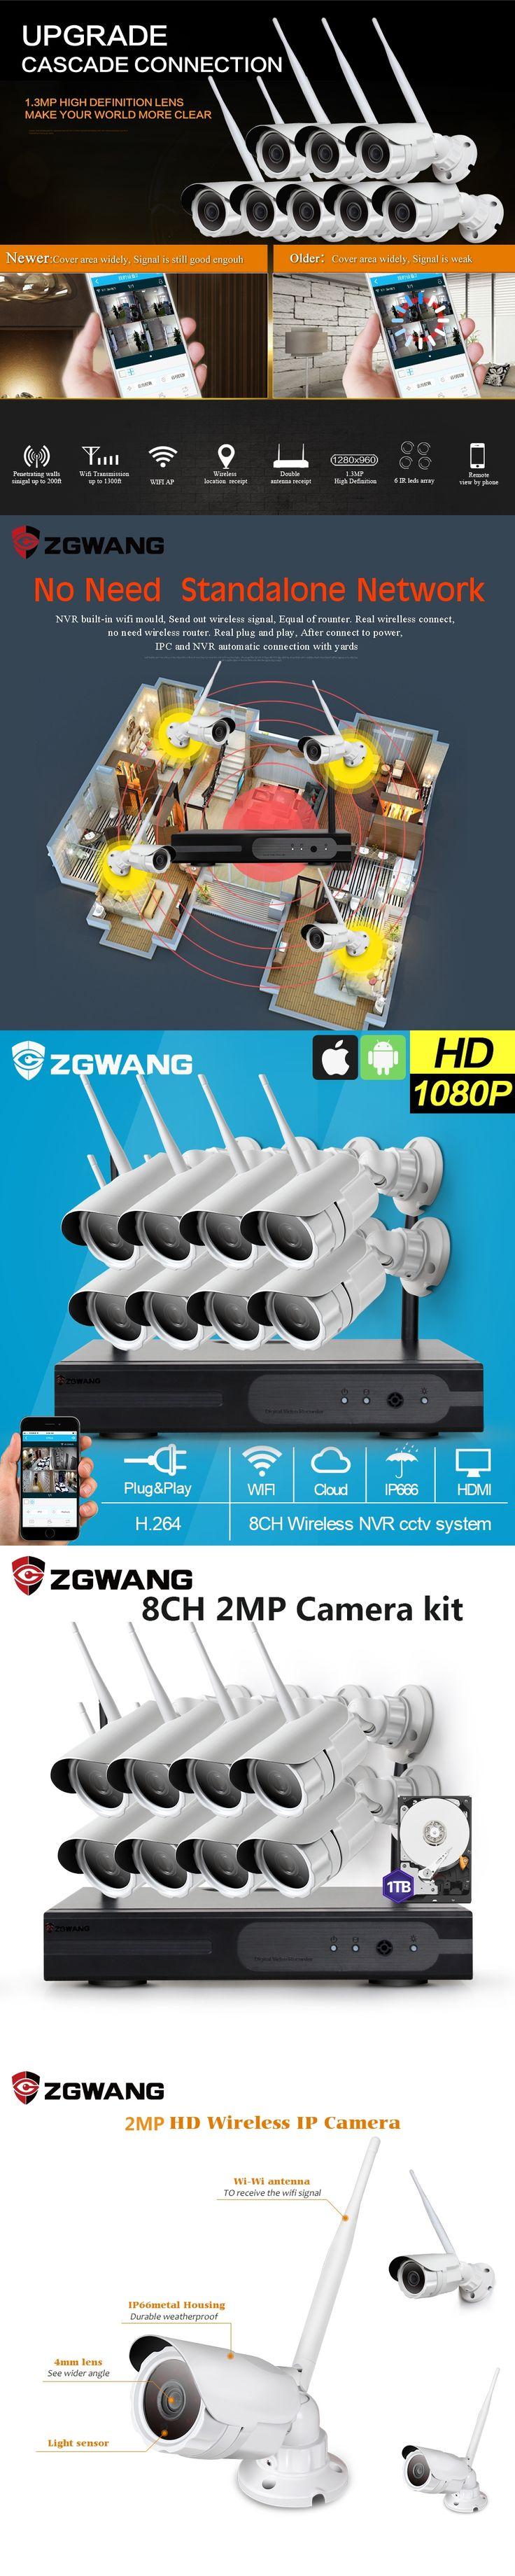 ZGWANG 8CH 2MP HD Wireless NVR Kit IP66 Outdoor HDMI NVR Kit Network 8CH CCTV Security Cameras System Surveillance Kit 1TB HDD